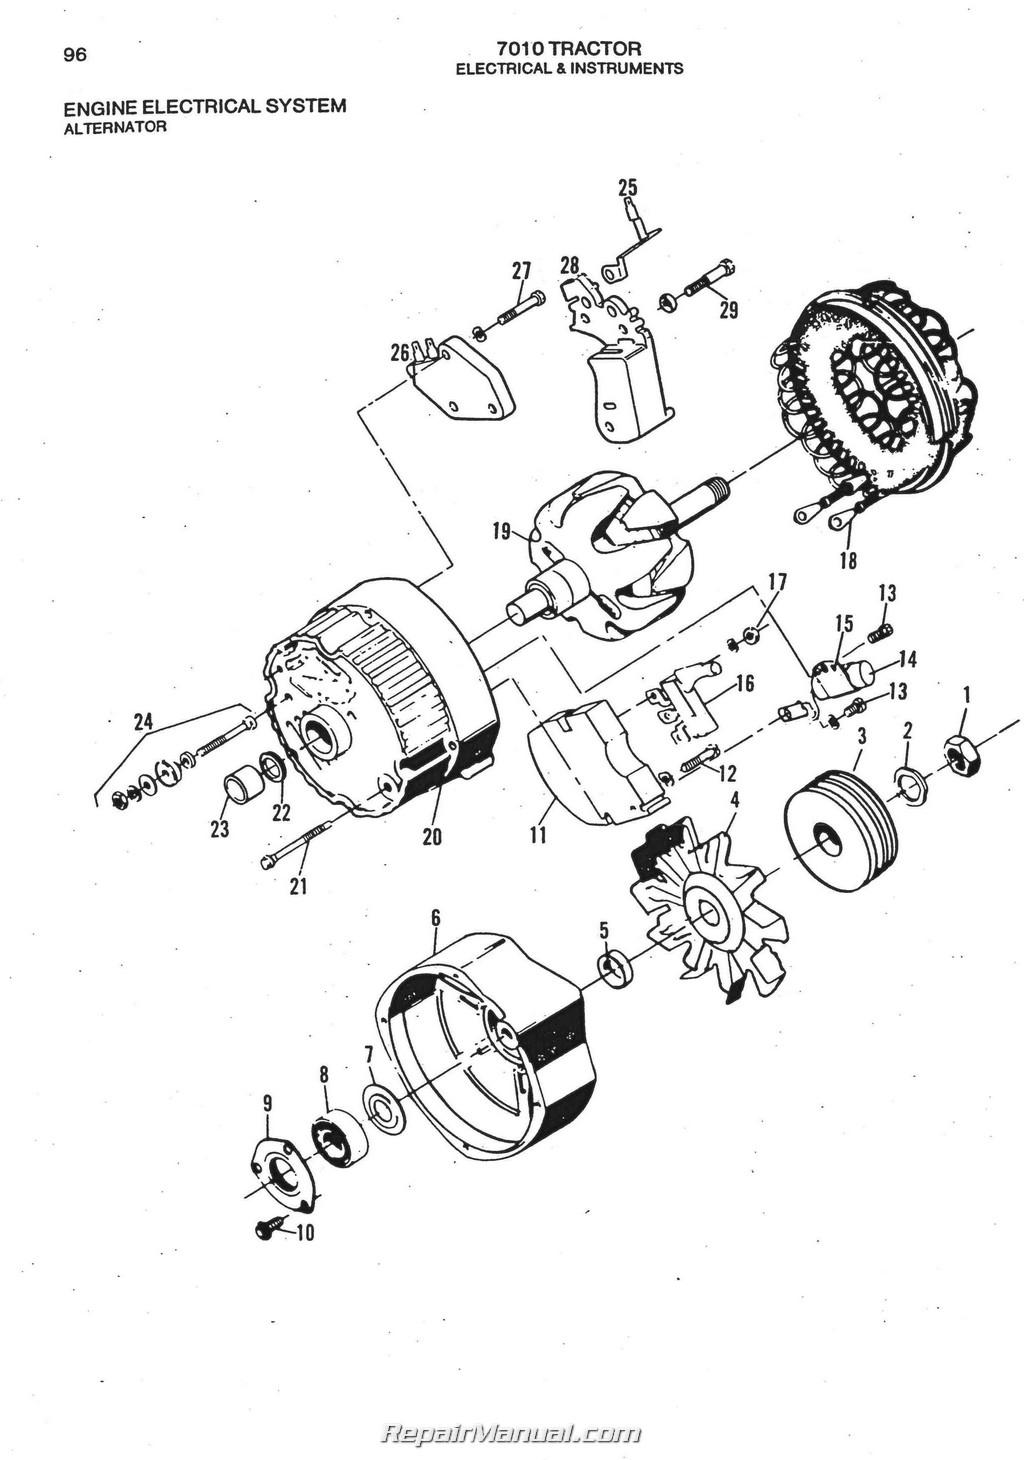 716 allis chalmers parts manual